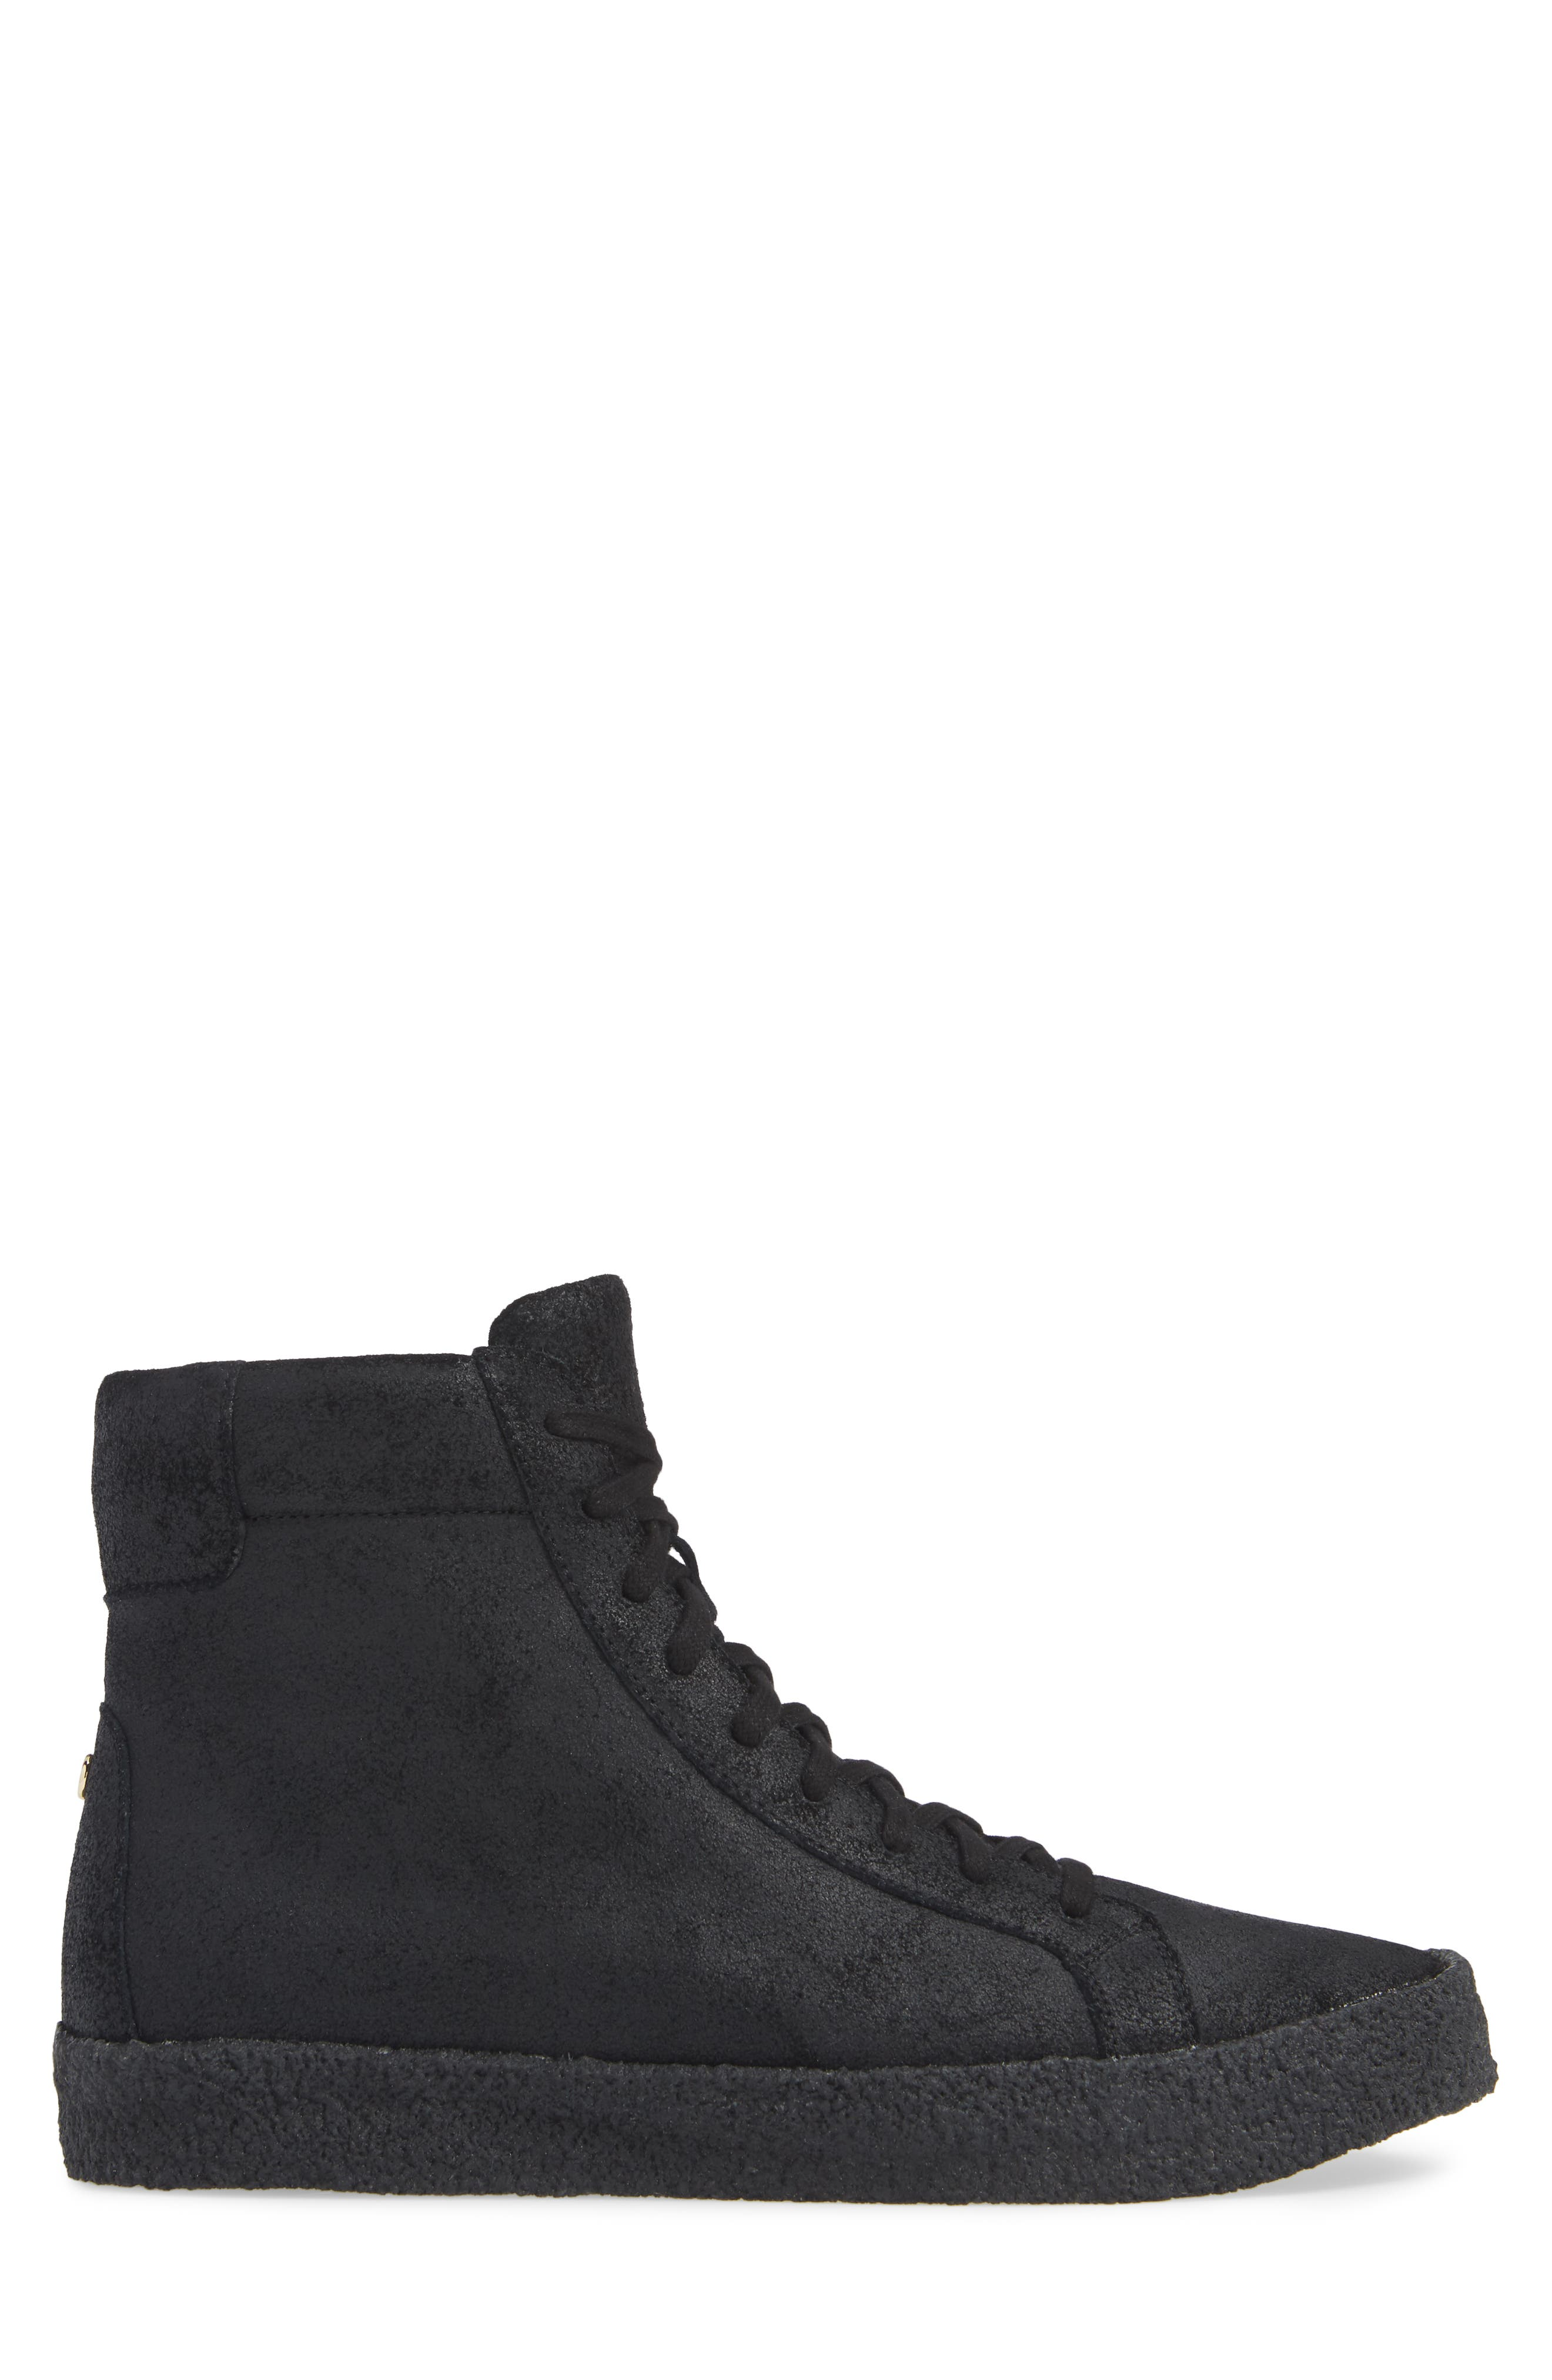 Apa High Top Sneaker,                             Alternate thumbnail 3, color,                             TRIPLE BLACK LEATHER